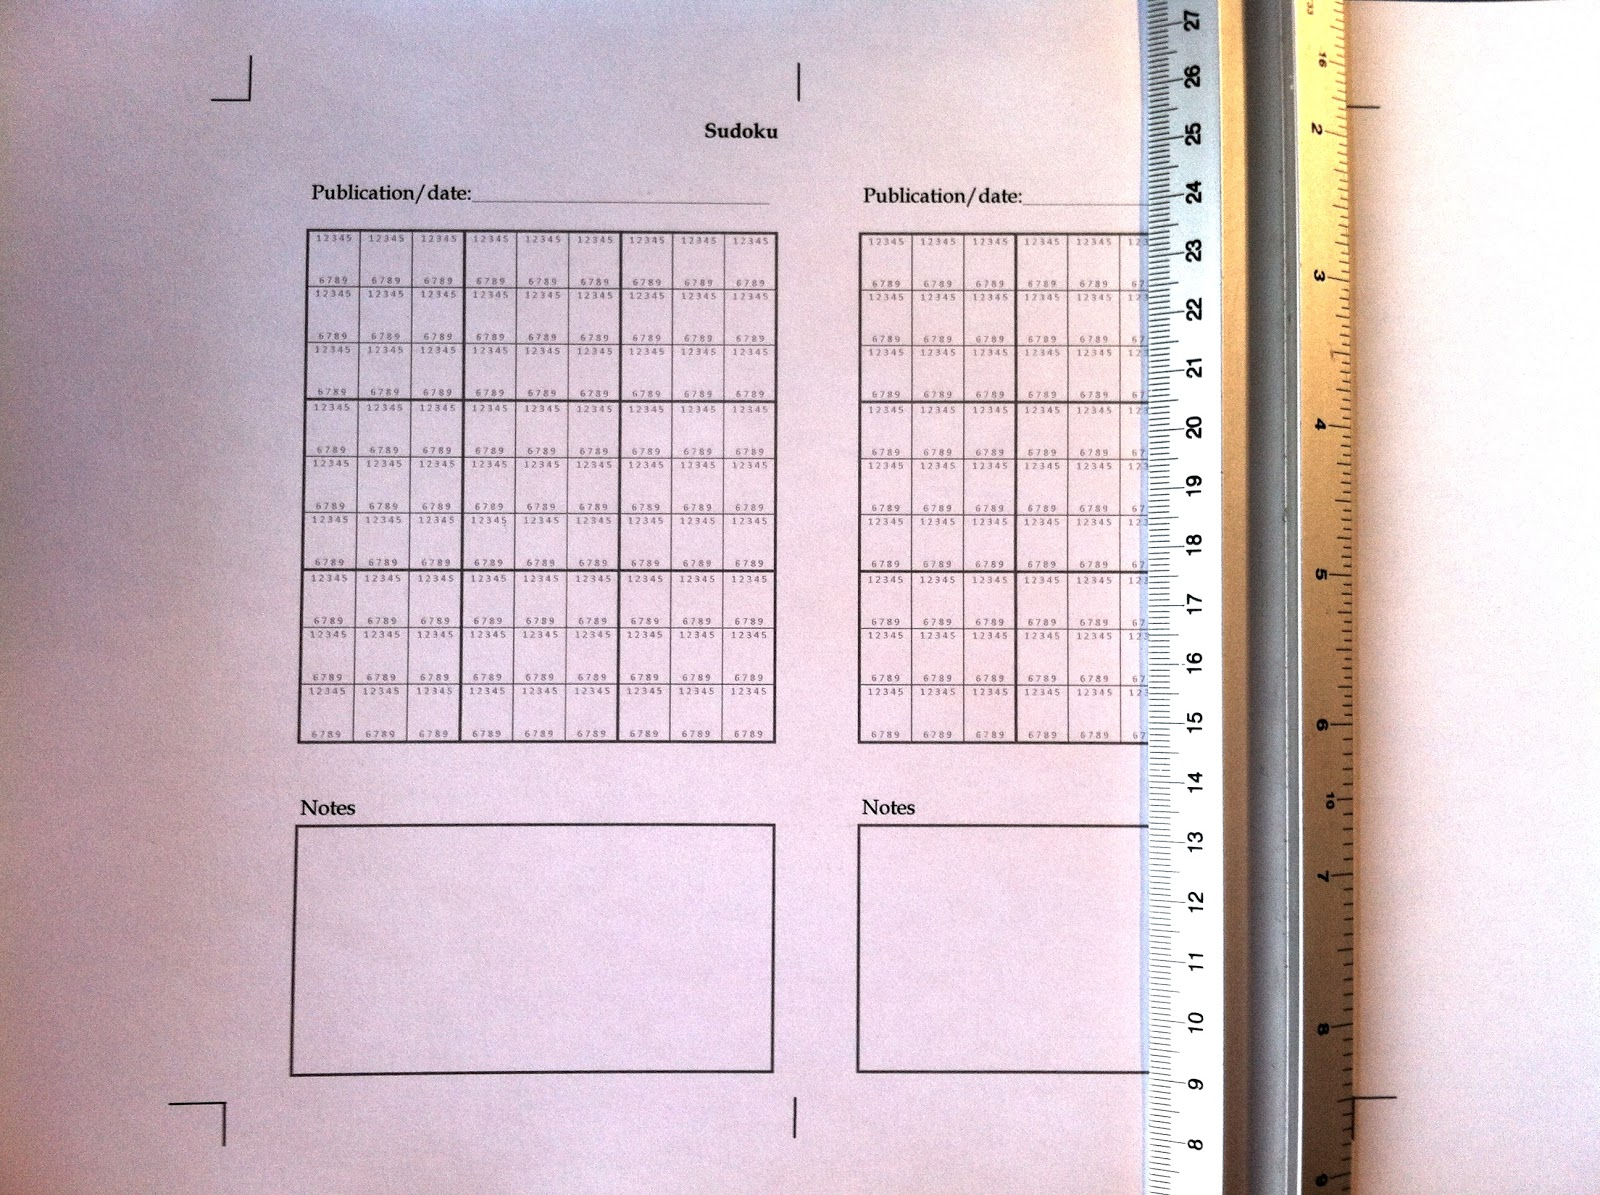 sudoku printen pdf - Dolap.magnetband.co